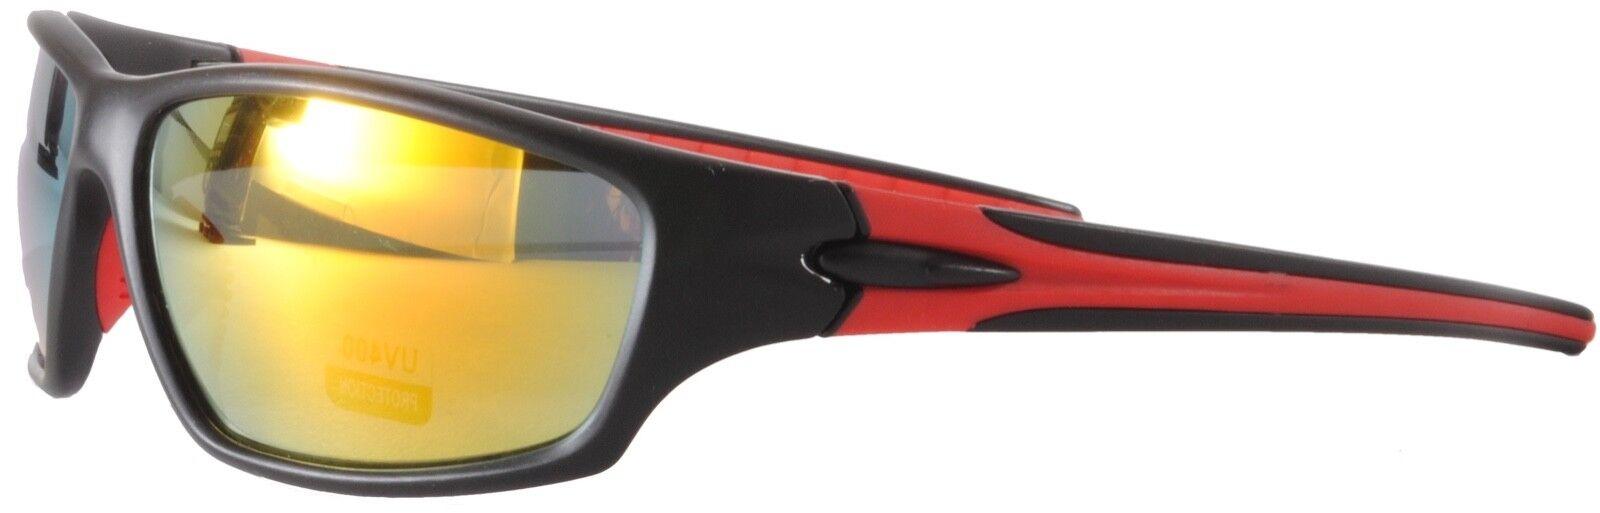 Porsche Design P868FA Matt Black Matt Silver Grey Sunglasses